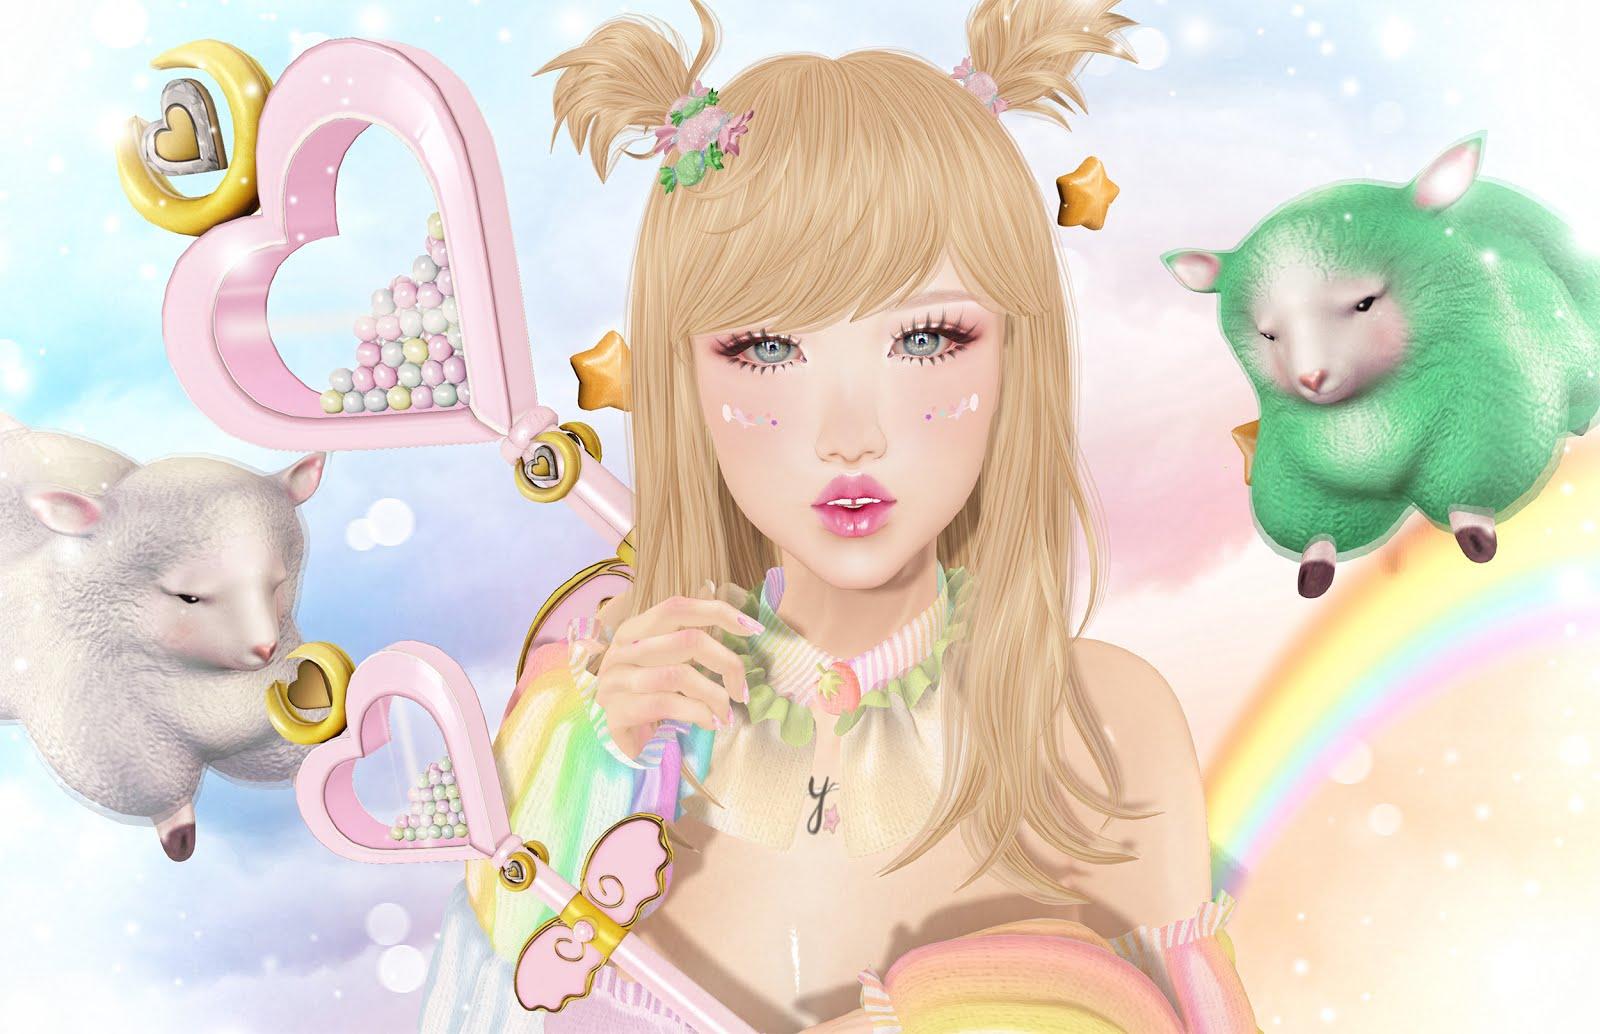 Cinderella Fashionista: Candy Dreams